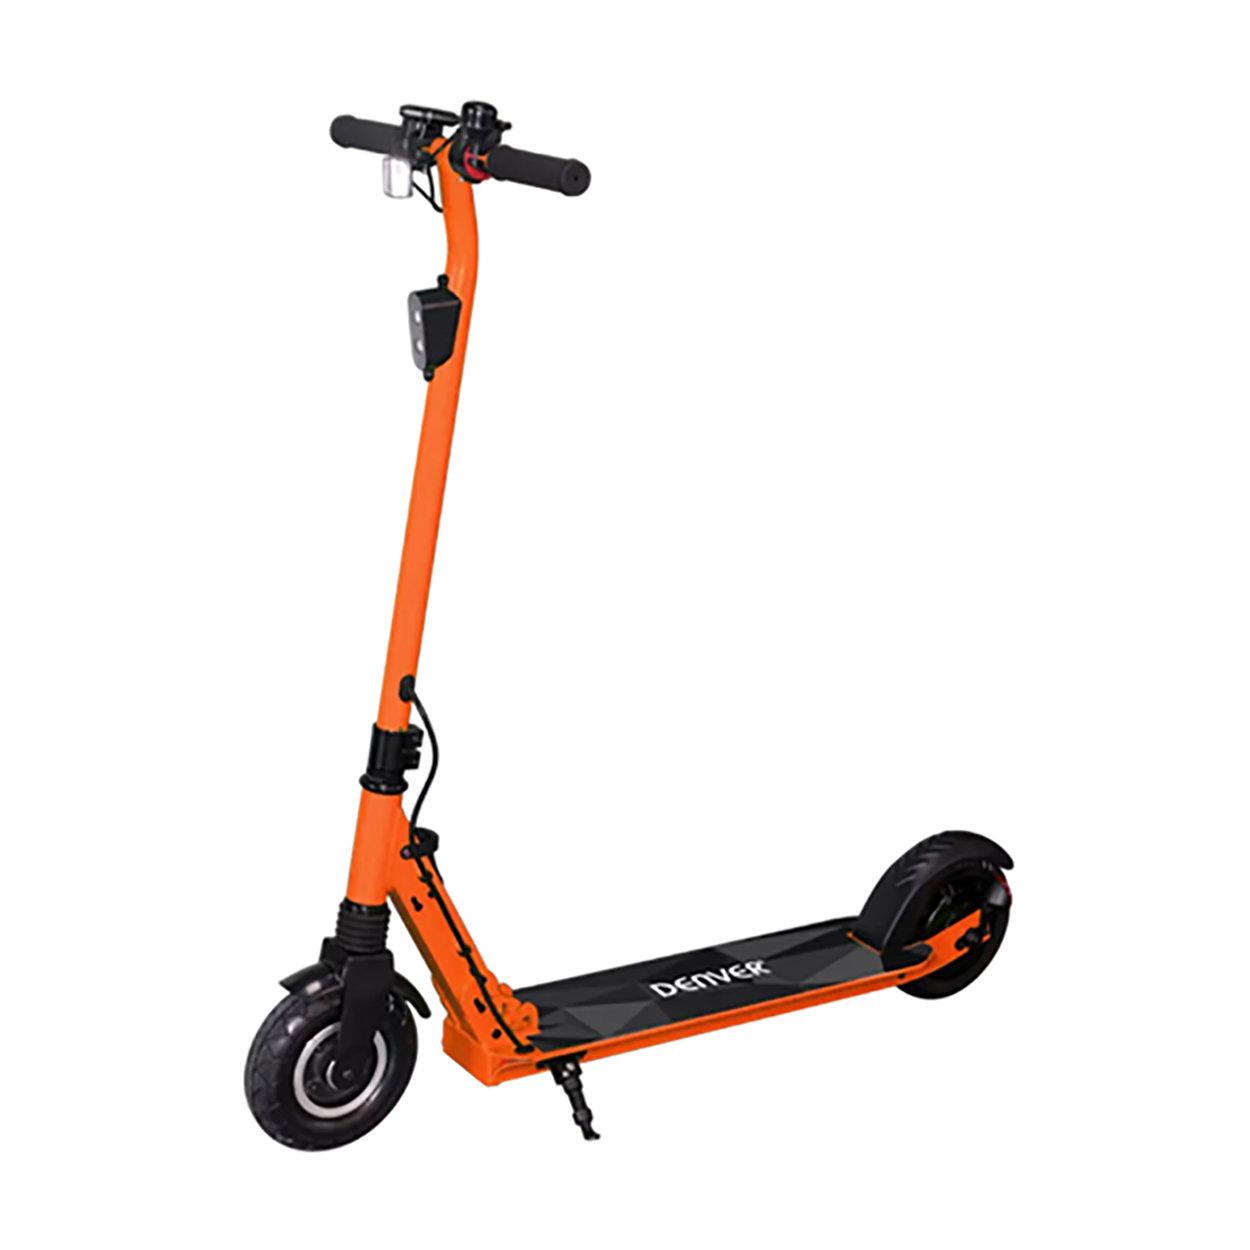 Denver Monopattino Elettrico 250W, arancione